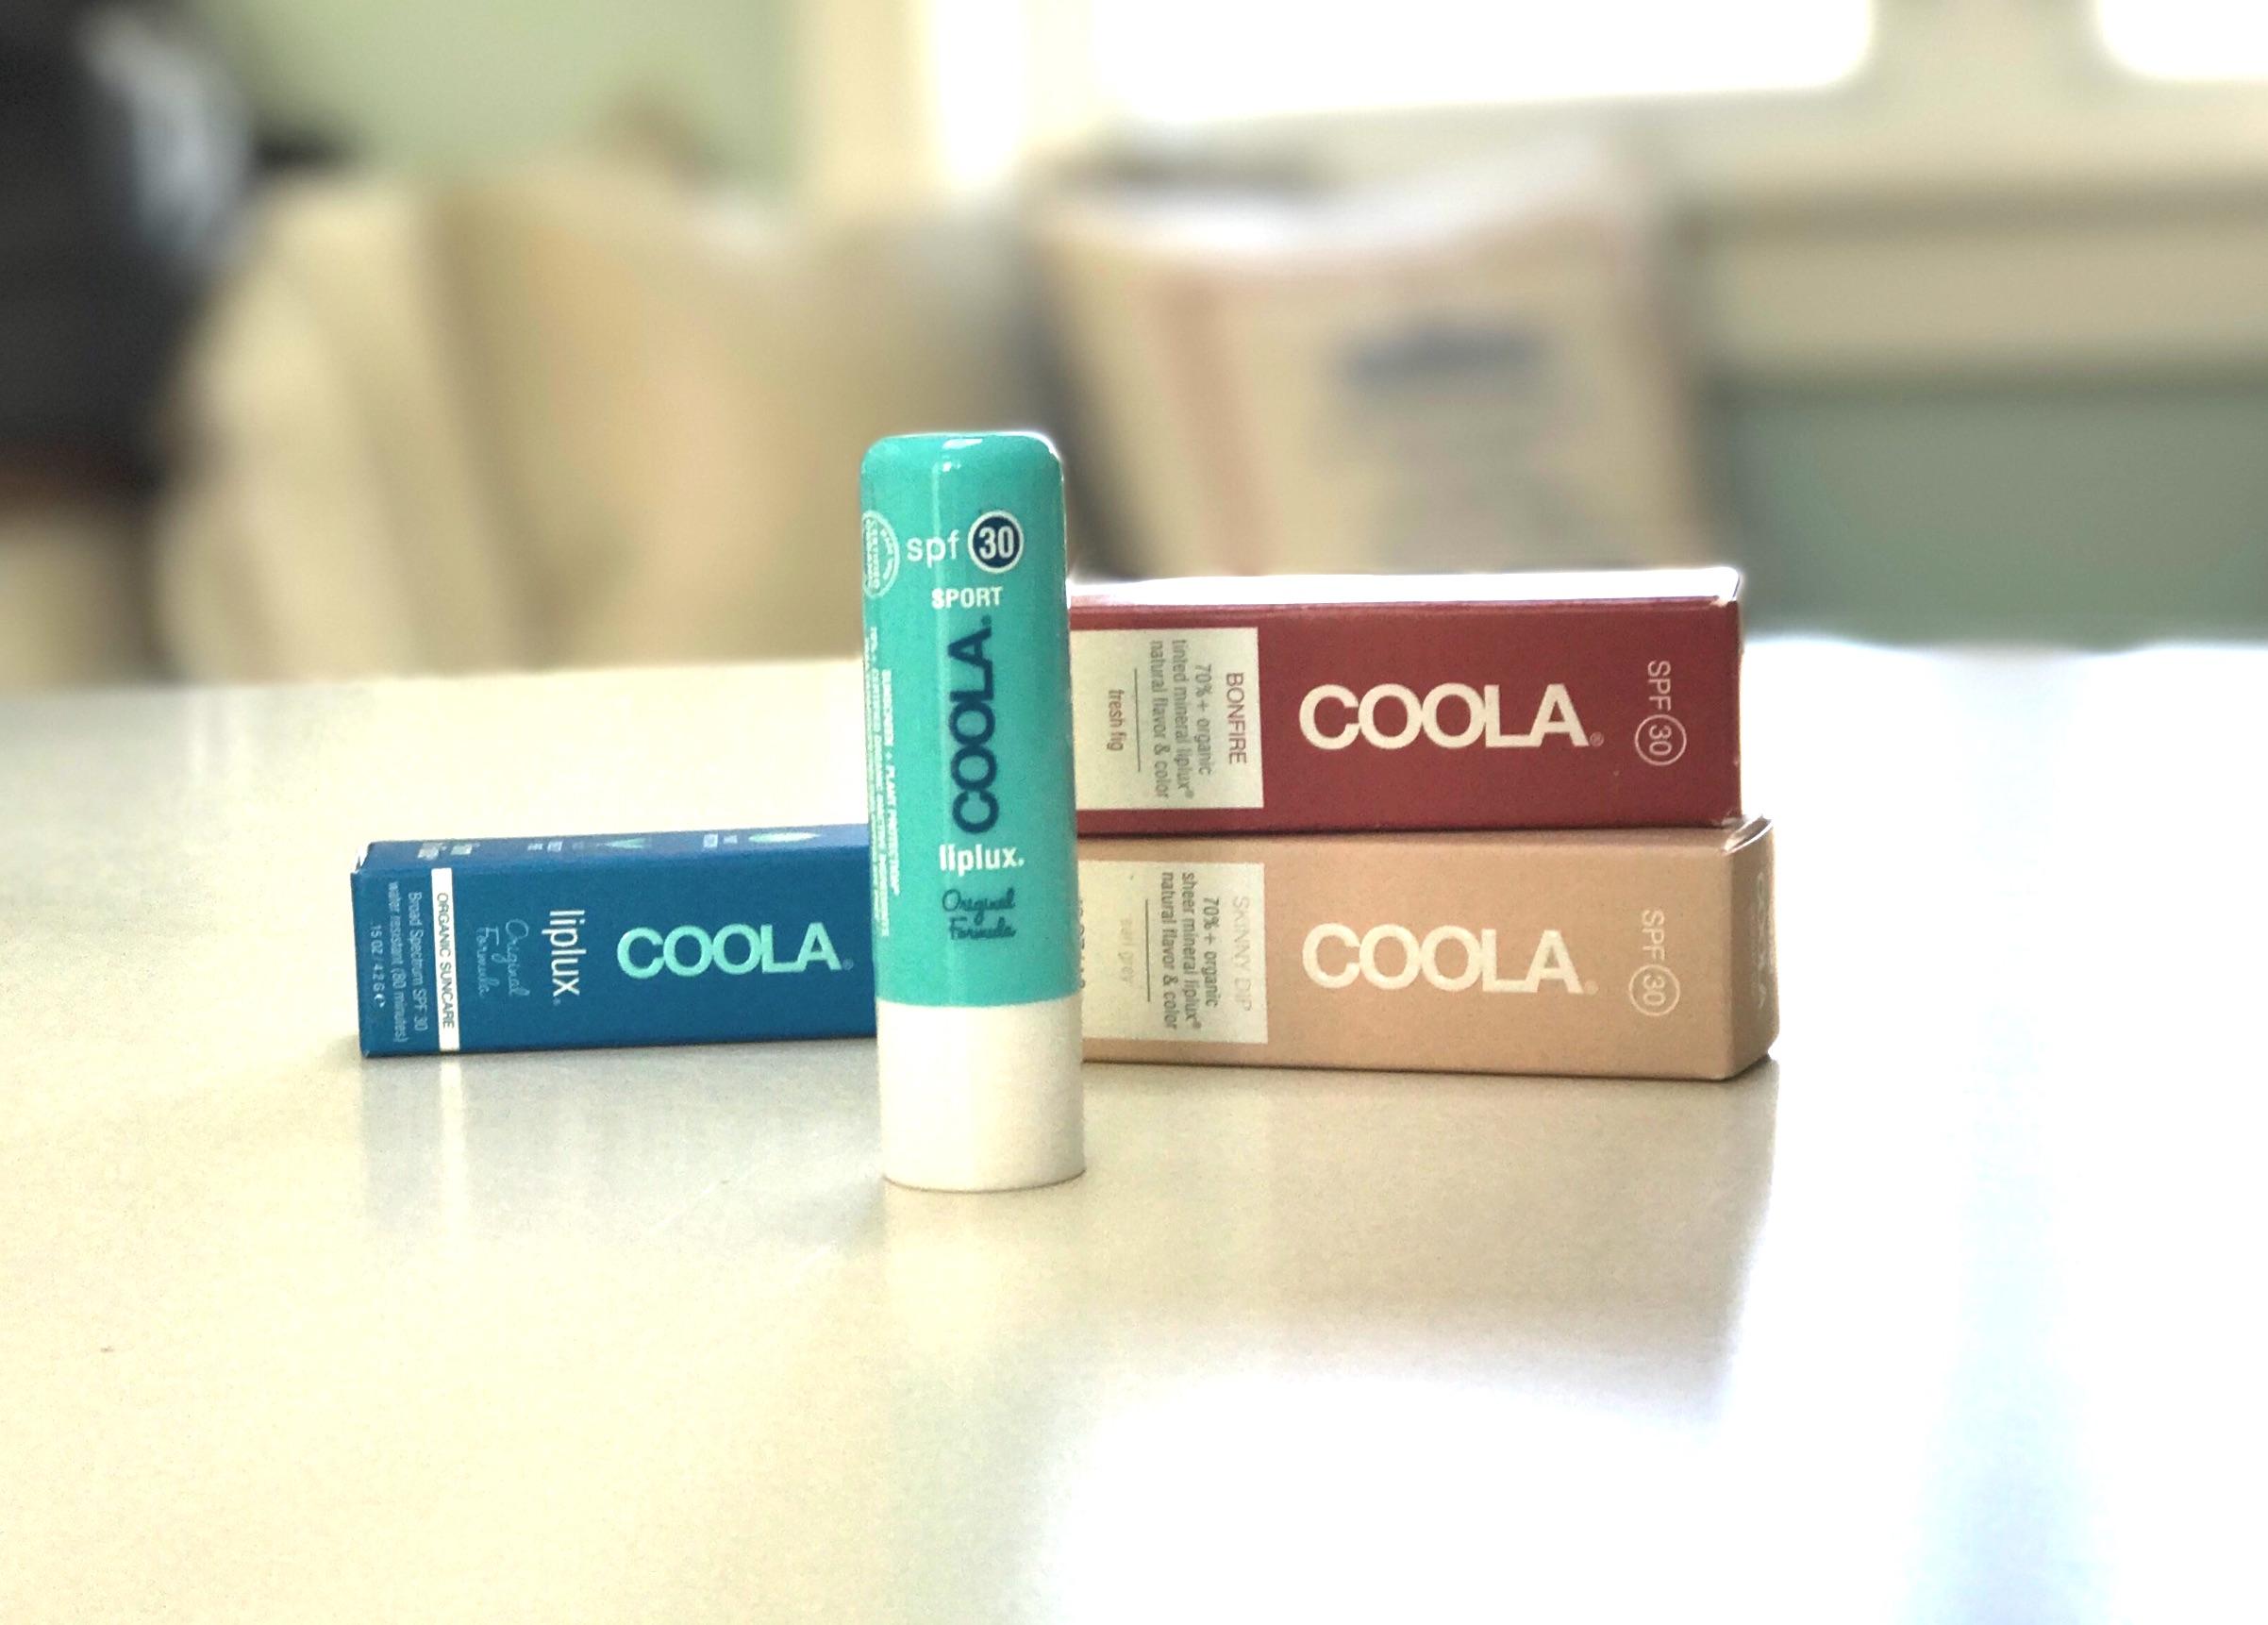 Coola lip